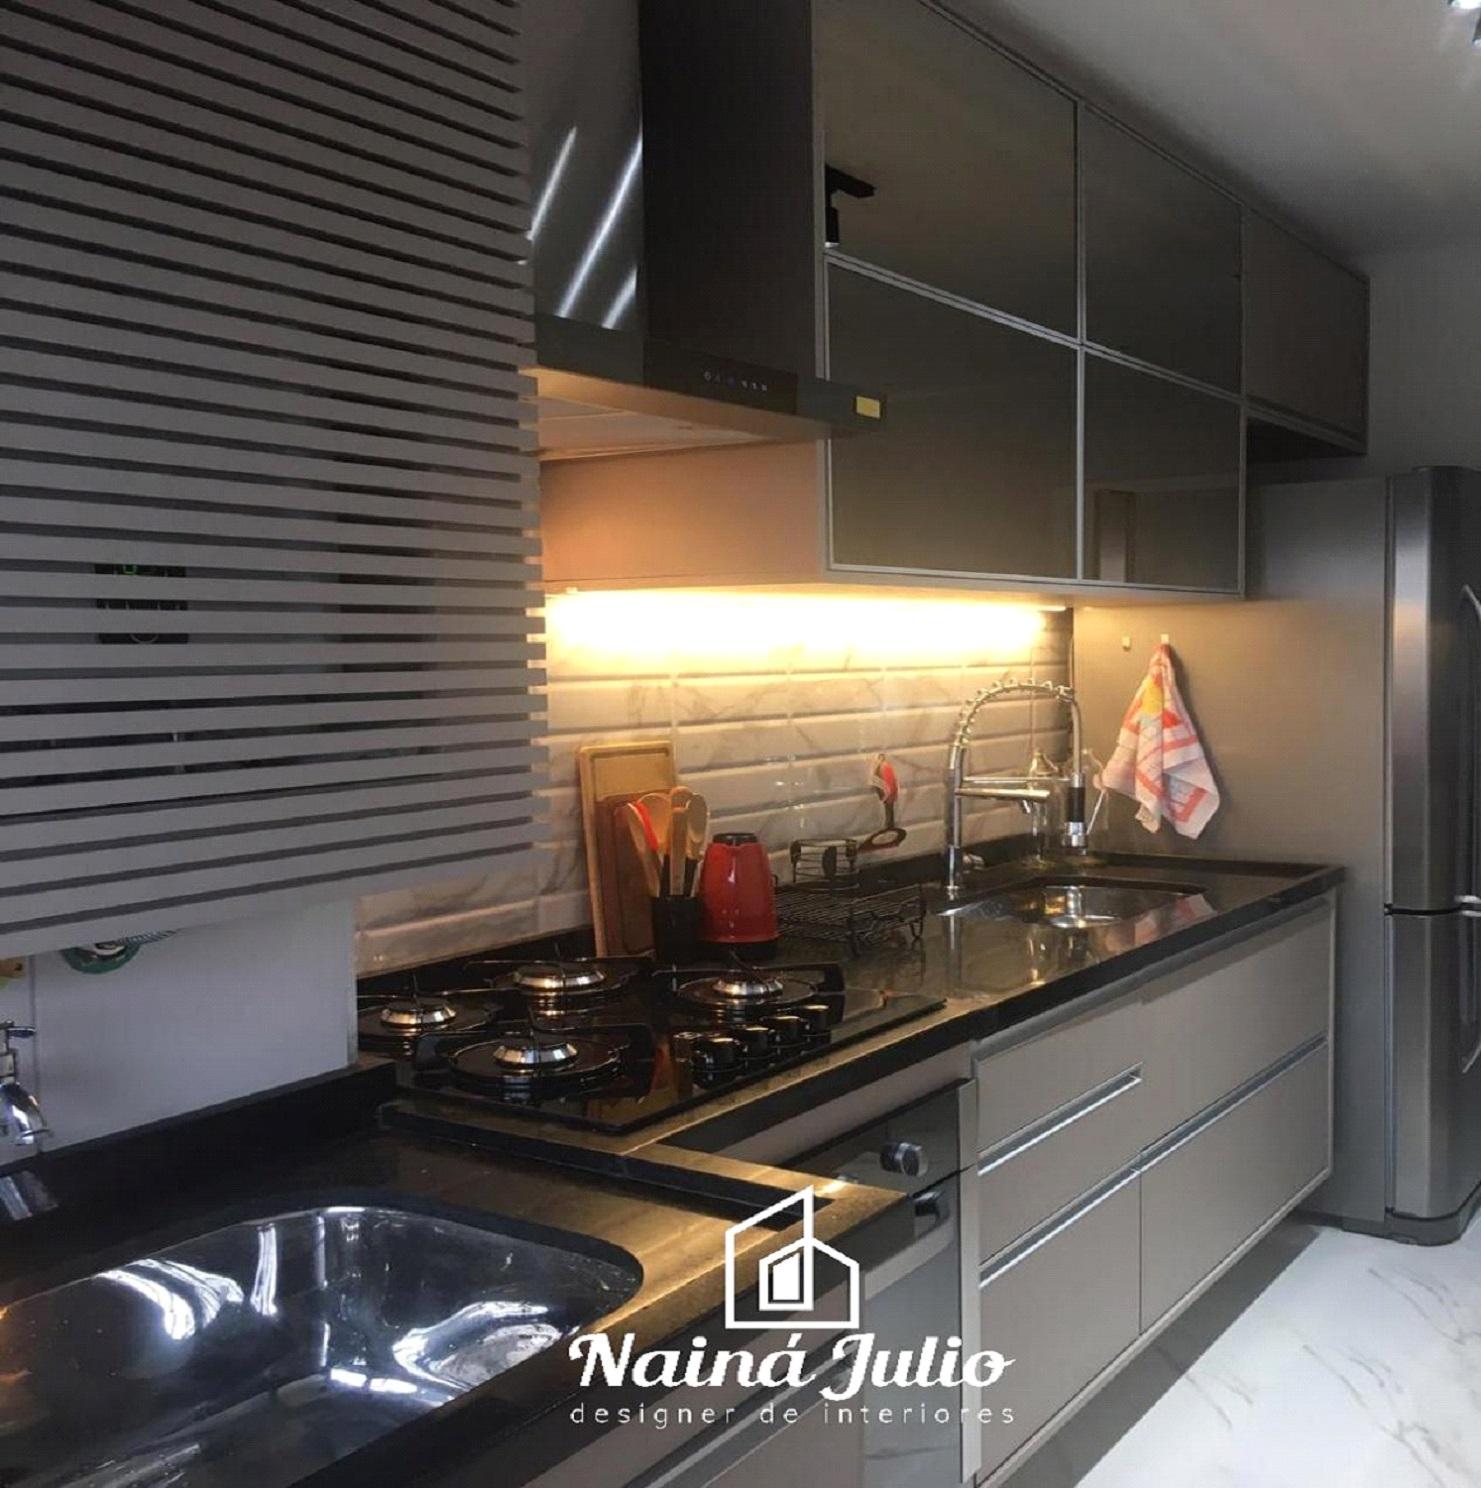 Projeto executivo - Cozinha - Nainá Julio